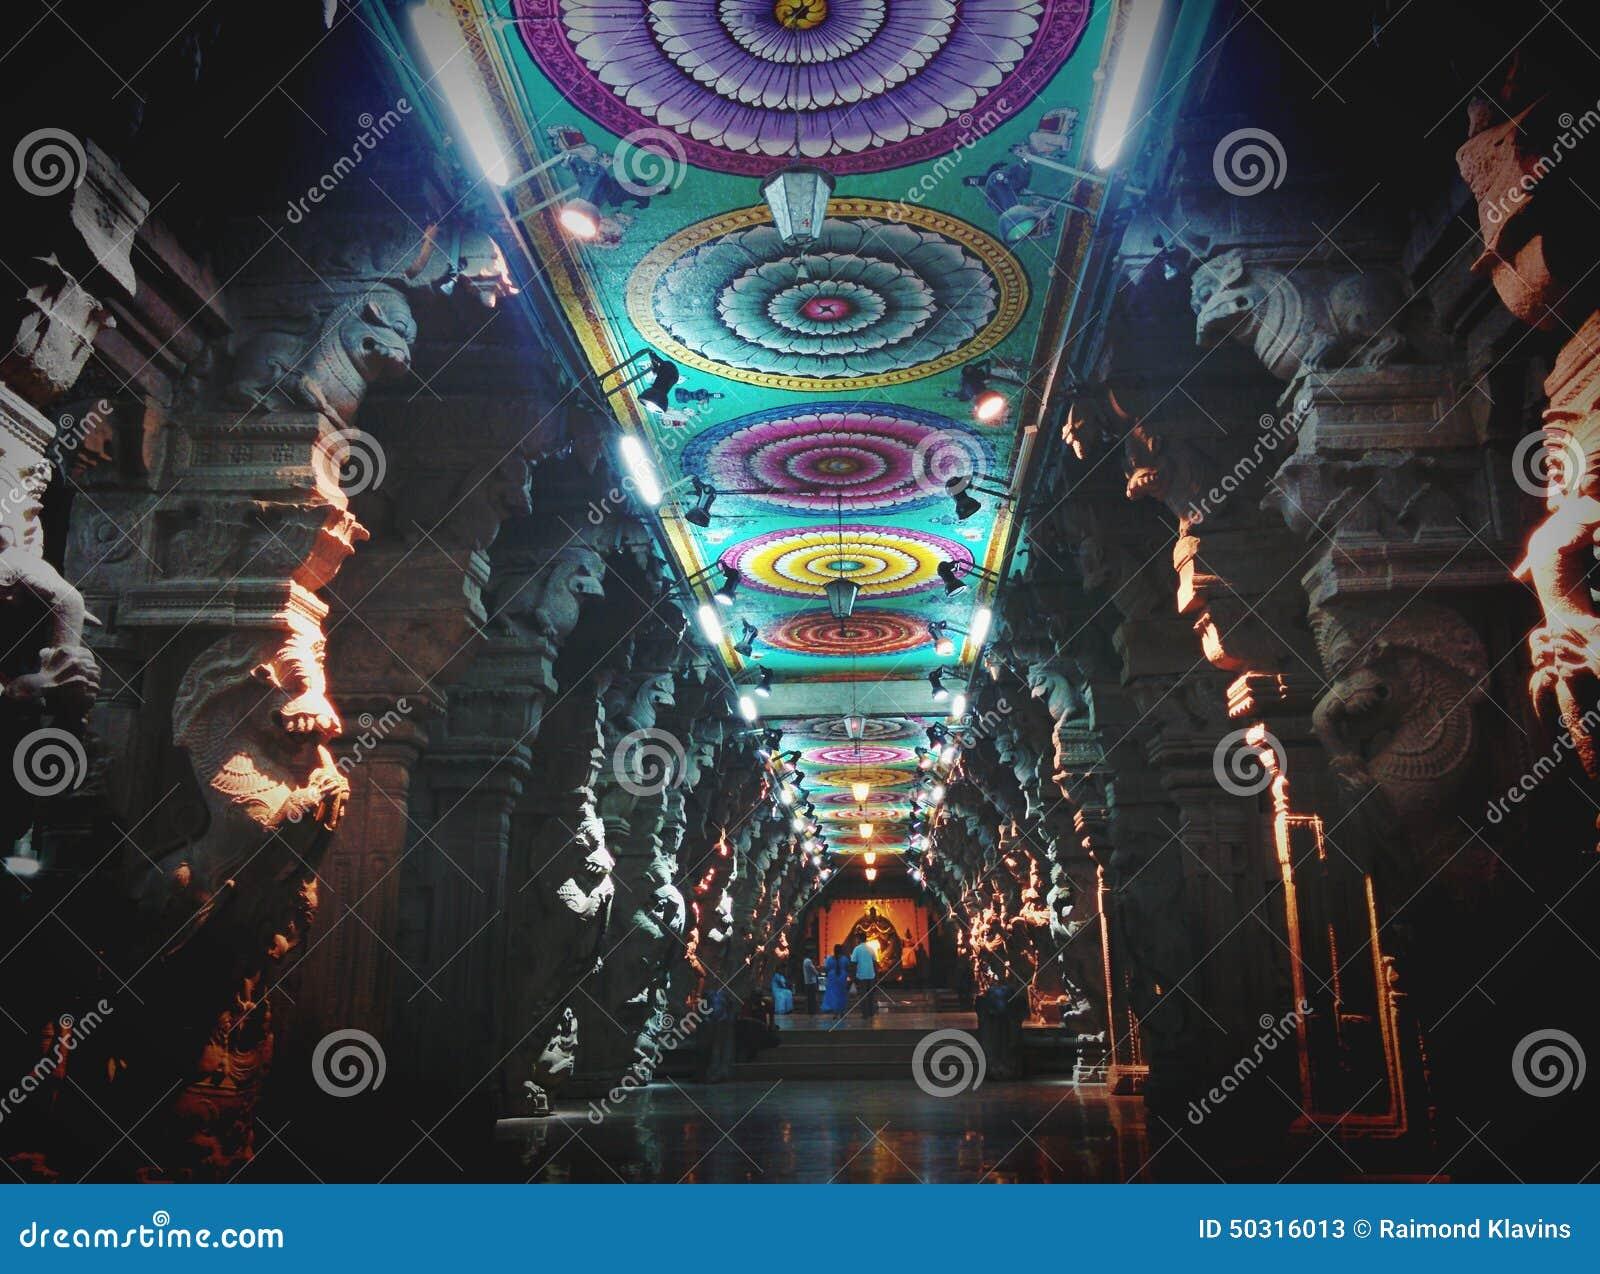 Hindu Temple Meenakshi